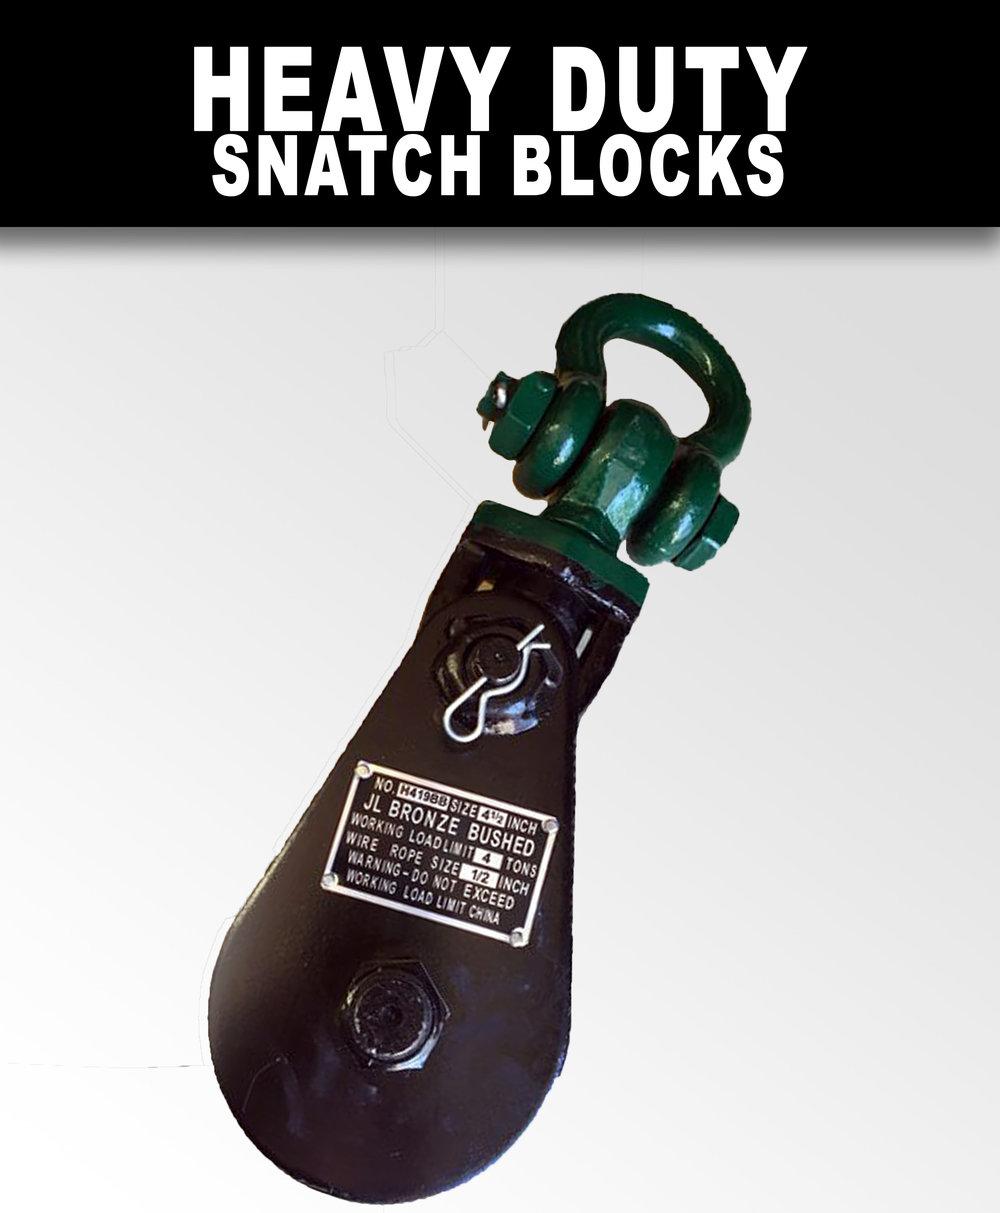 snatch_block_01.jpg